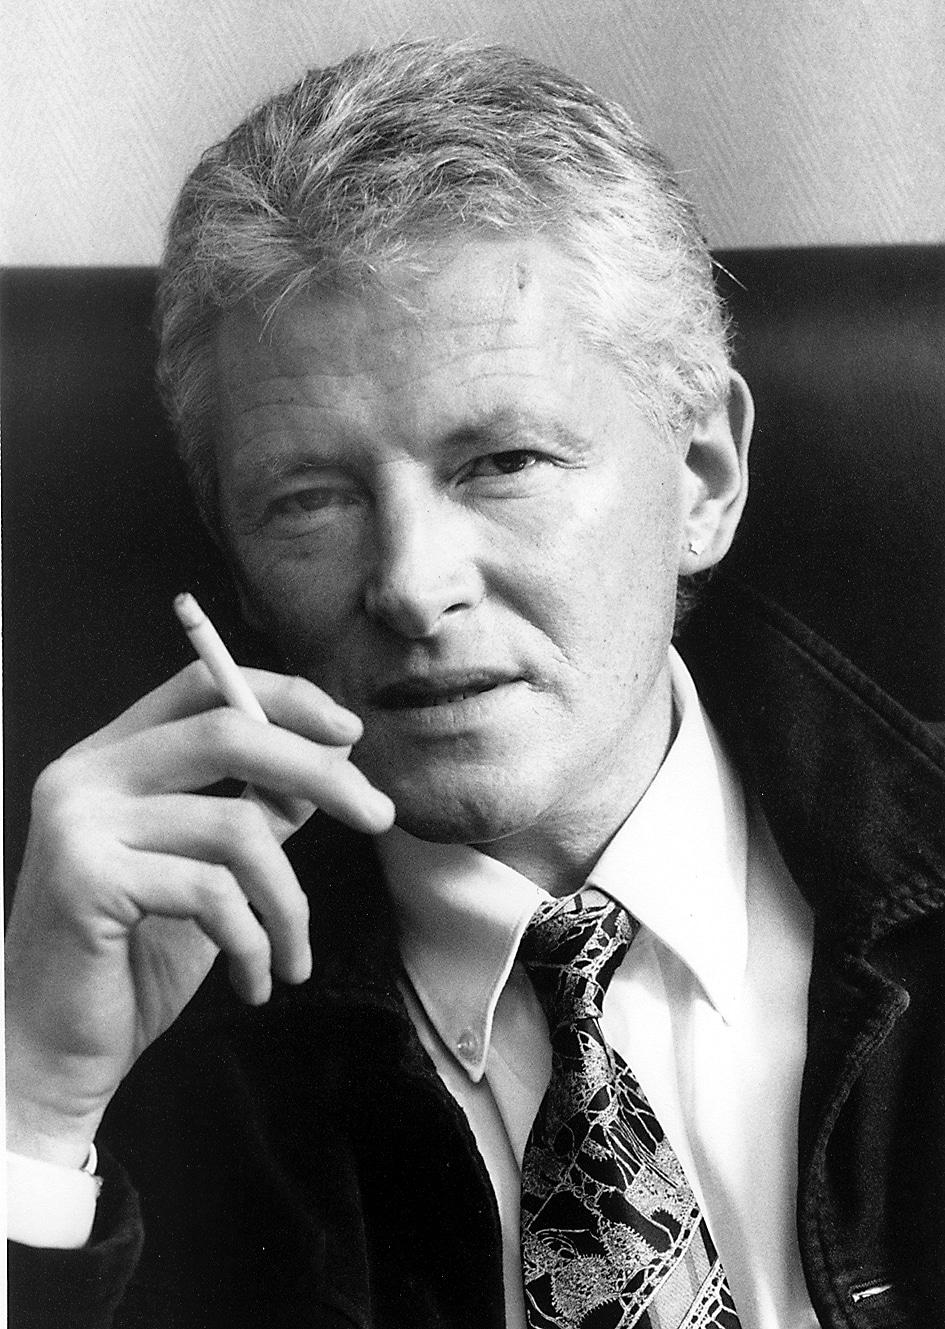 Michel C. Thomas